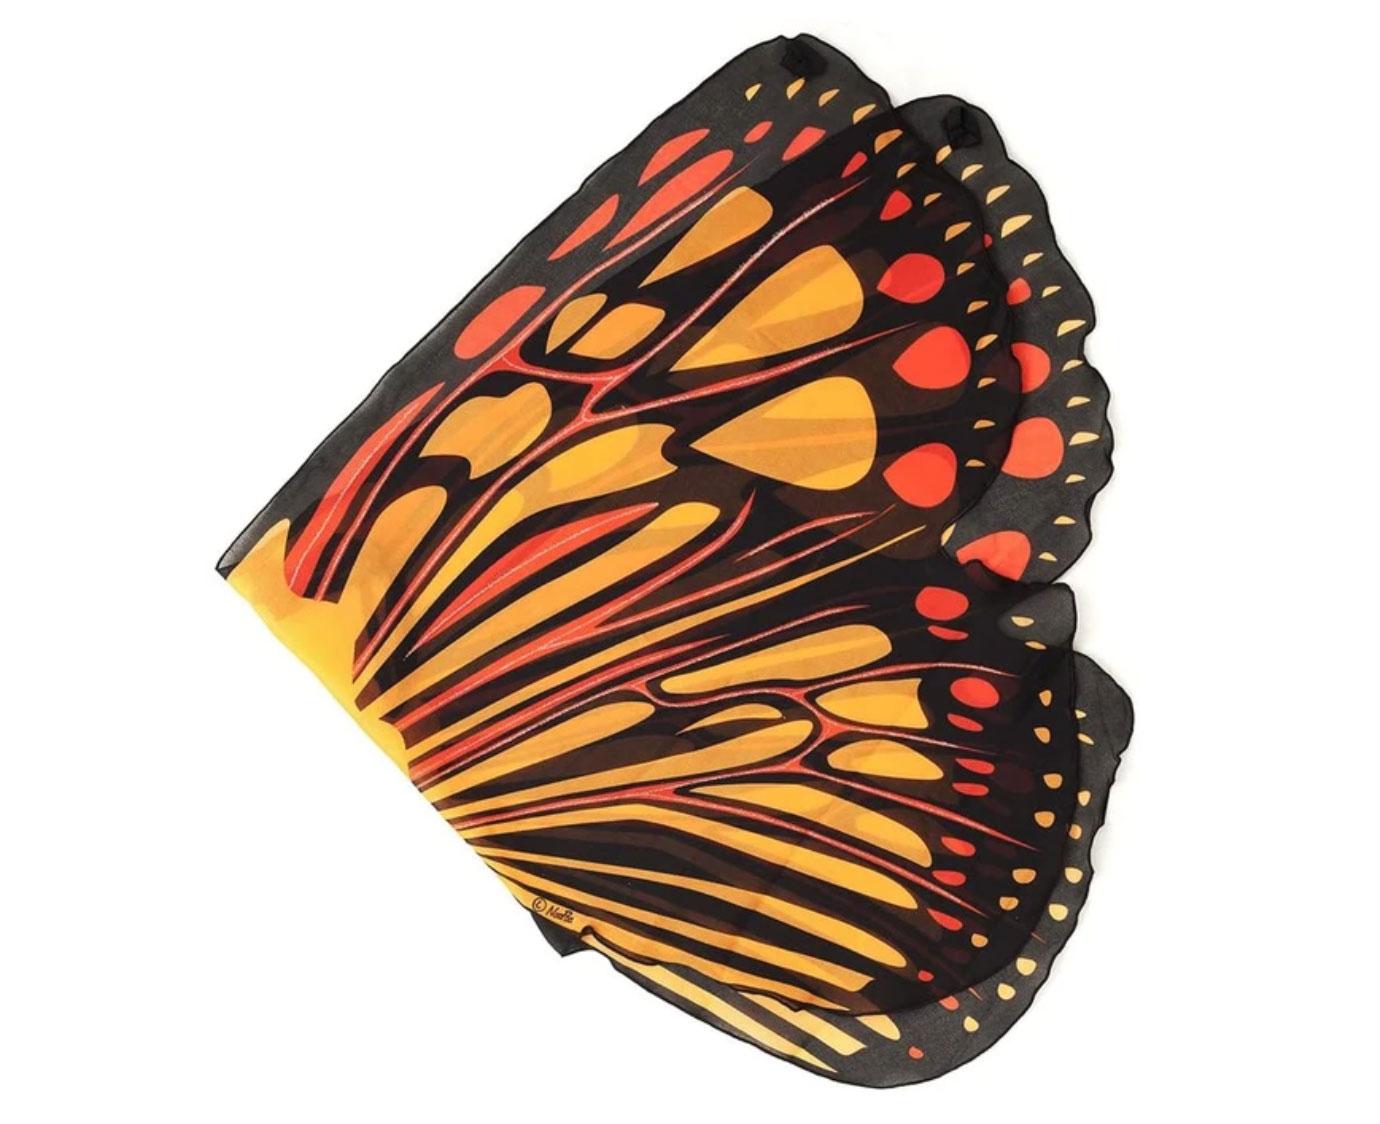 Vleugels 'Burst Orange'